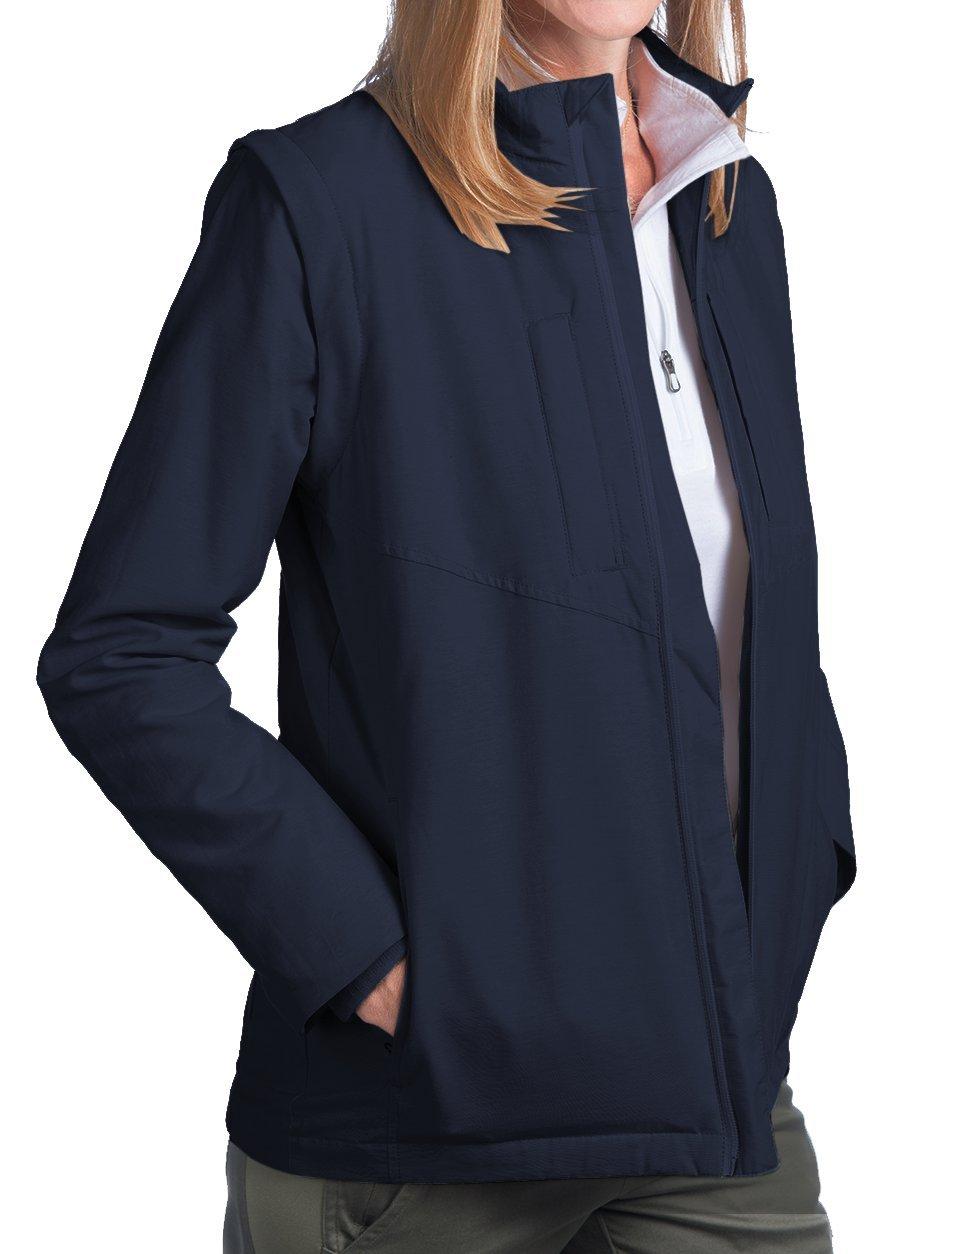 SCOTTeVEST Women's Standard Jacket - 25 Pockets - Travel Clothing (Small, Navy)